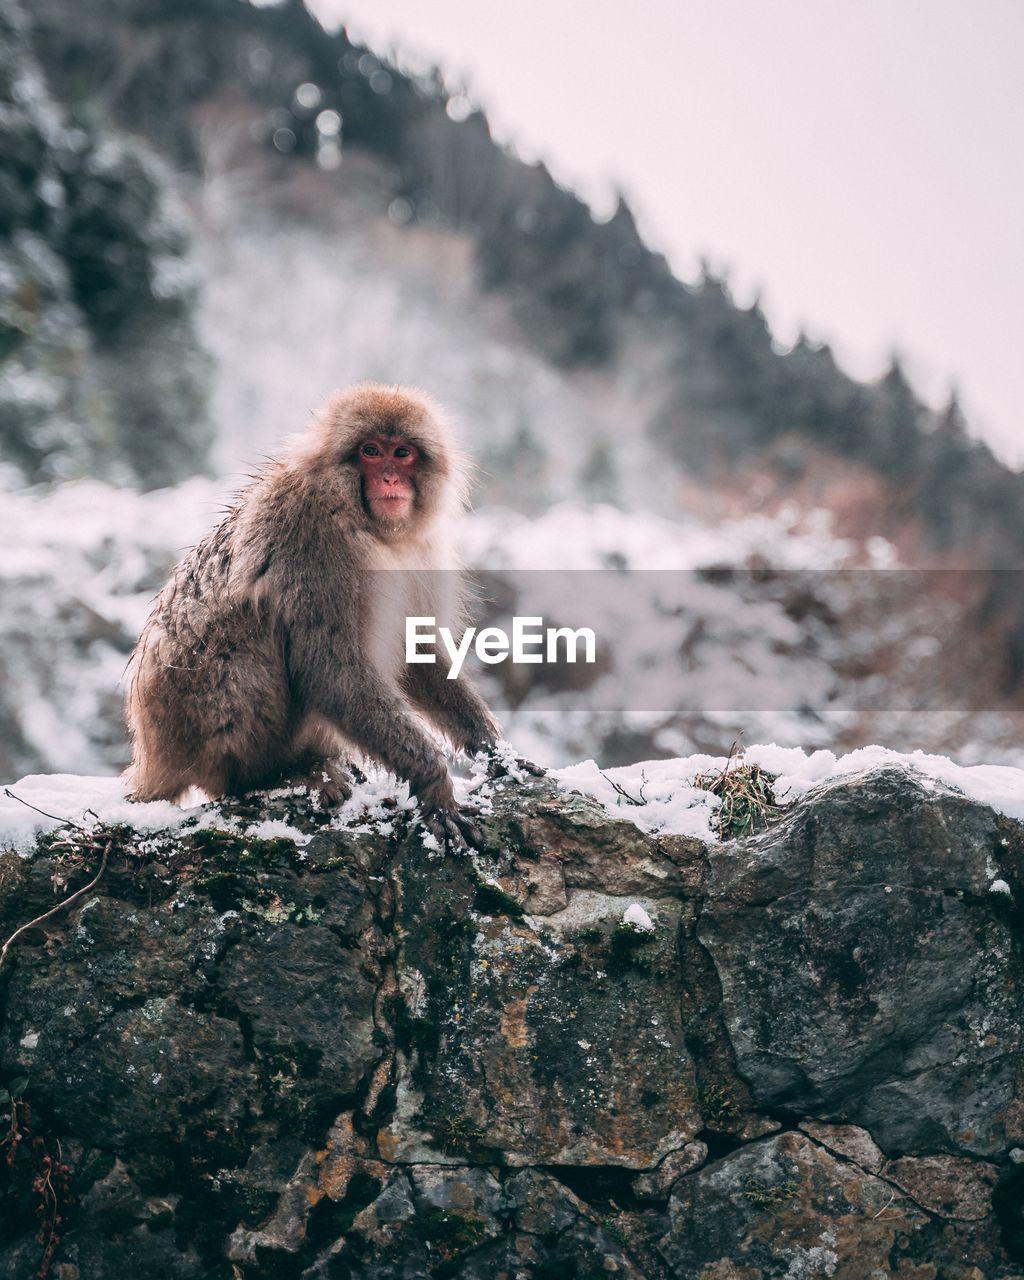 Monkey sitting on mountain during winter